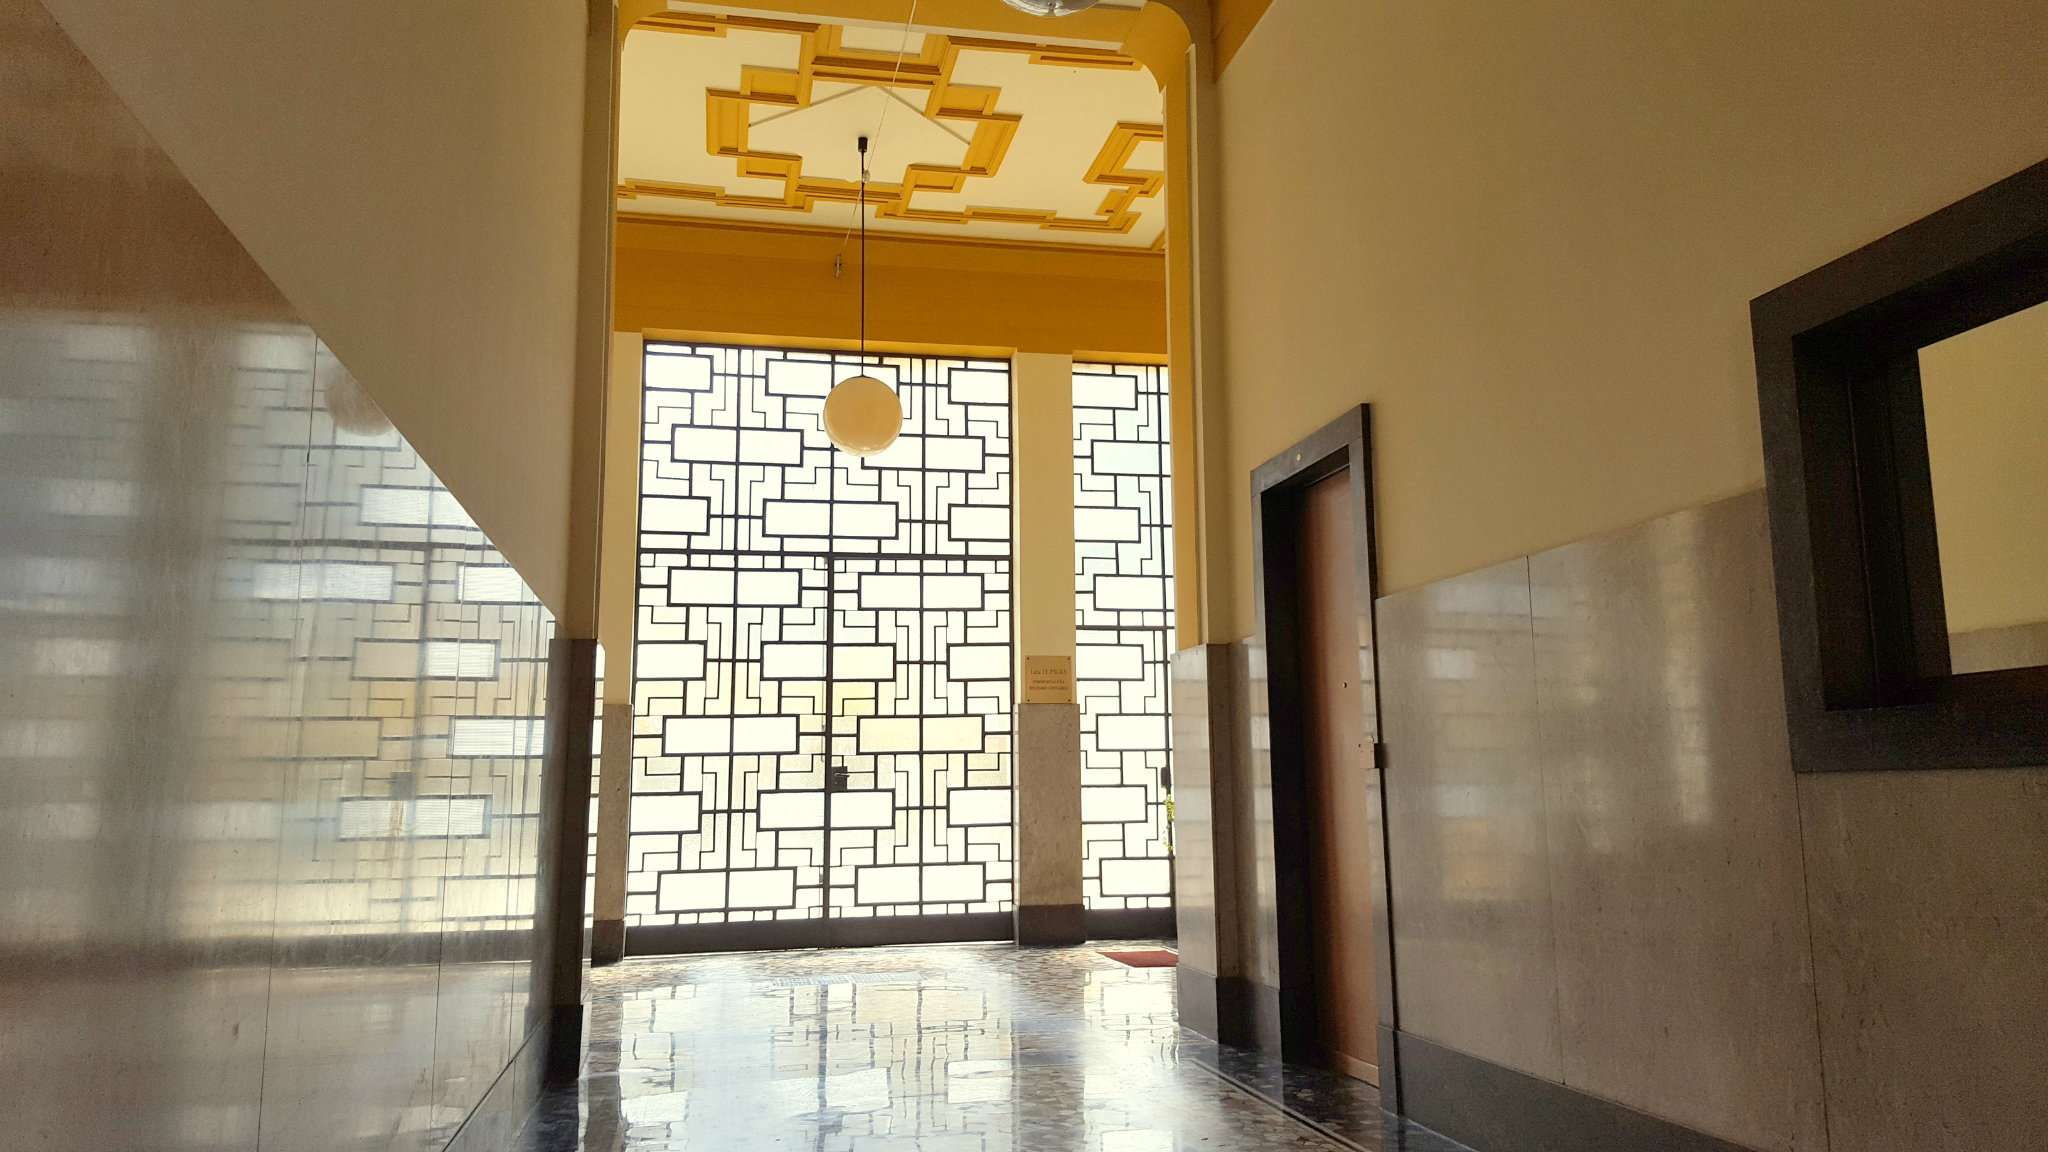 Appartamento in vendita Zona Cit Turin, San Donato, Campidoglio - via Amedeo Peyron 45 Torino